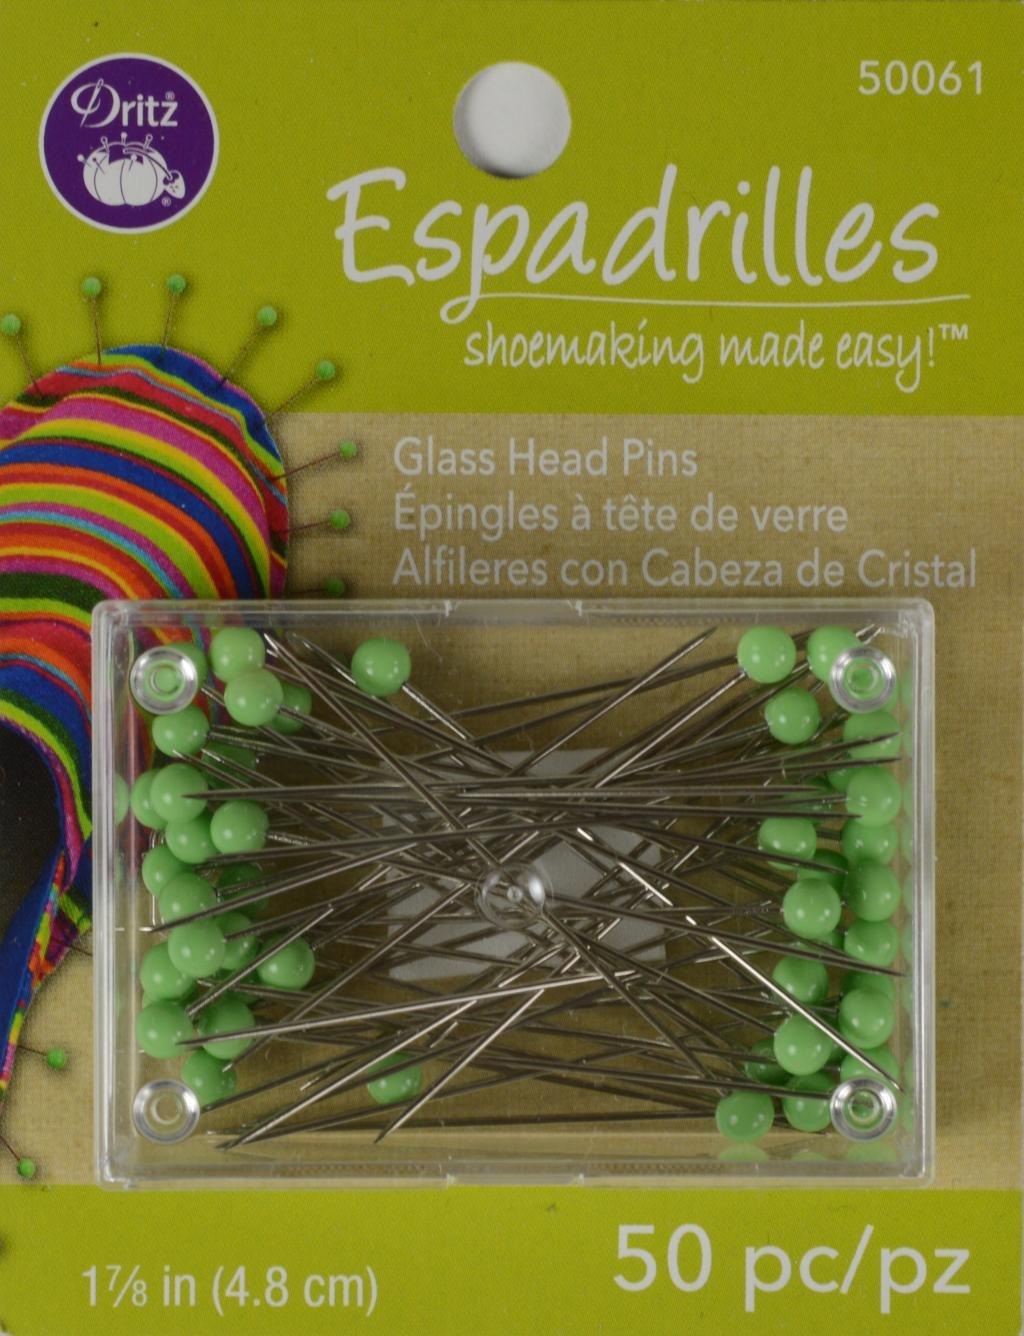 Espadrilles Shoemaking Glass Head Pins